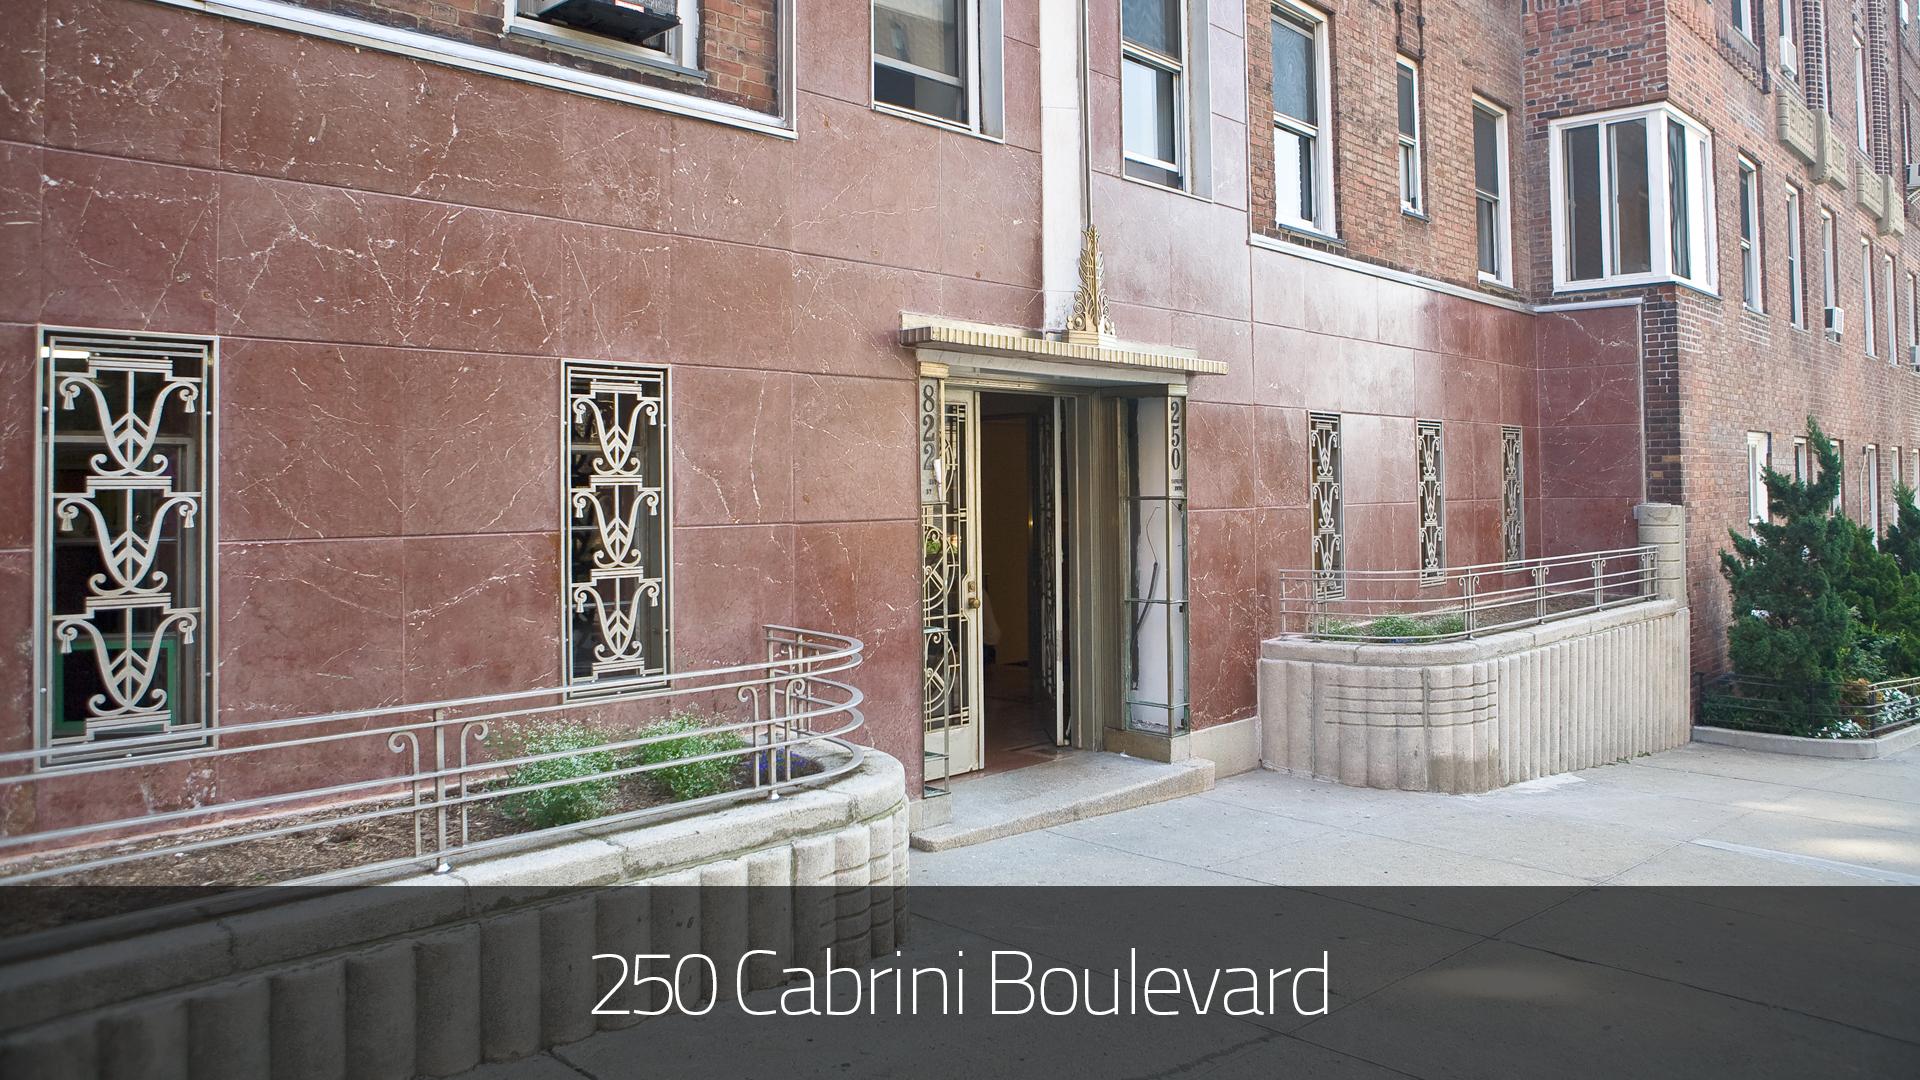 250 cabrini boulevard